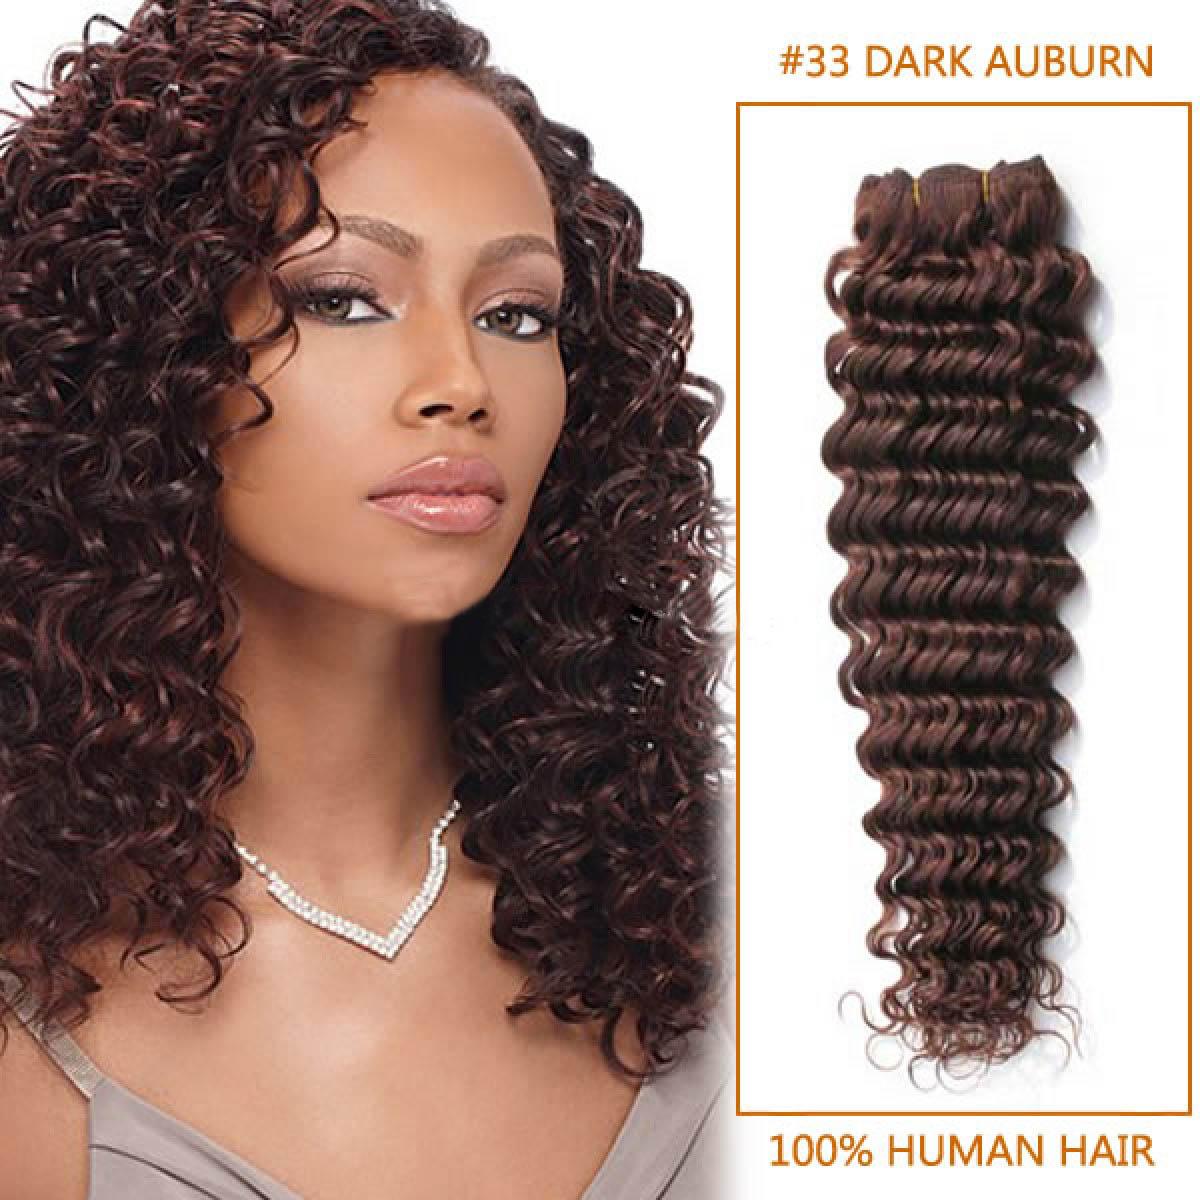 20 Inch 33 Dark Auburn Deep Wave Indian Remy Hair Wefts